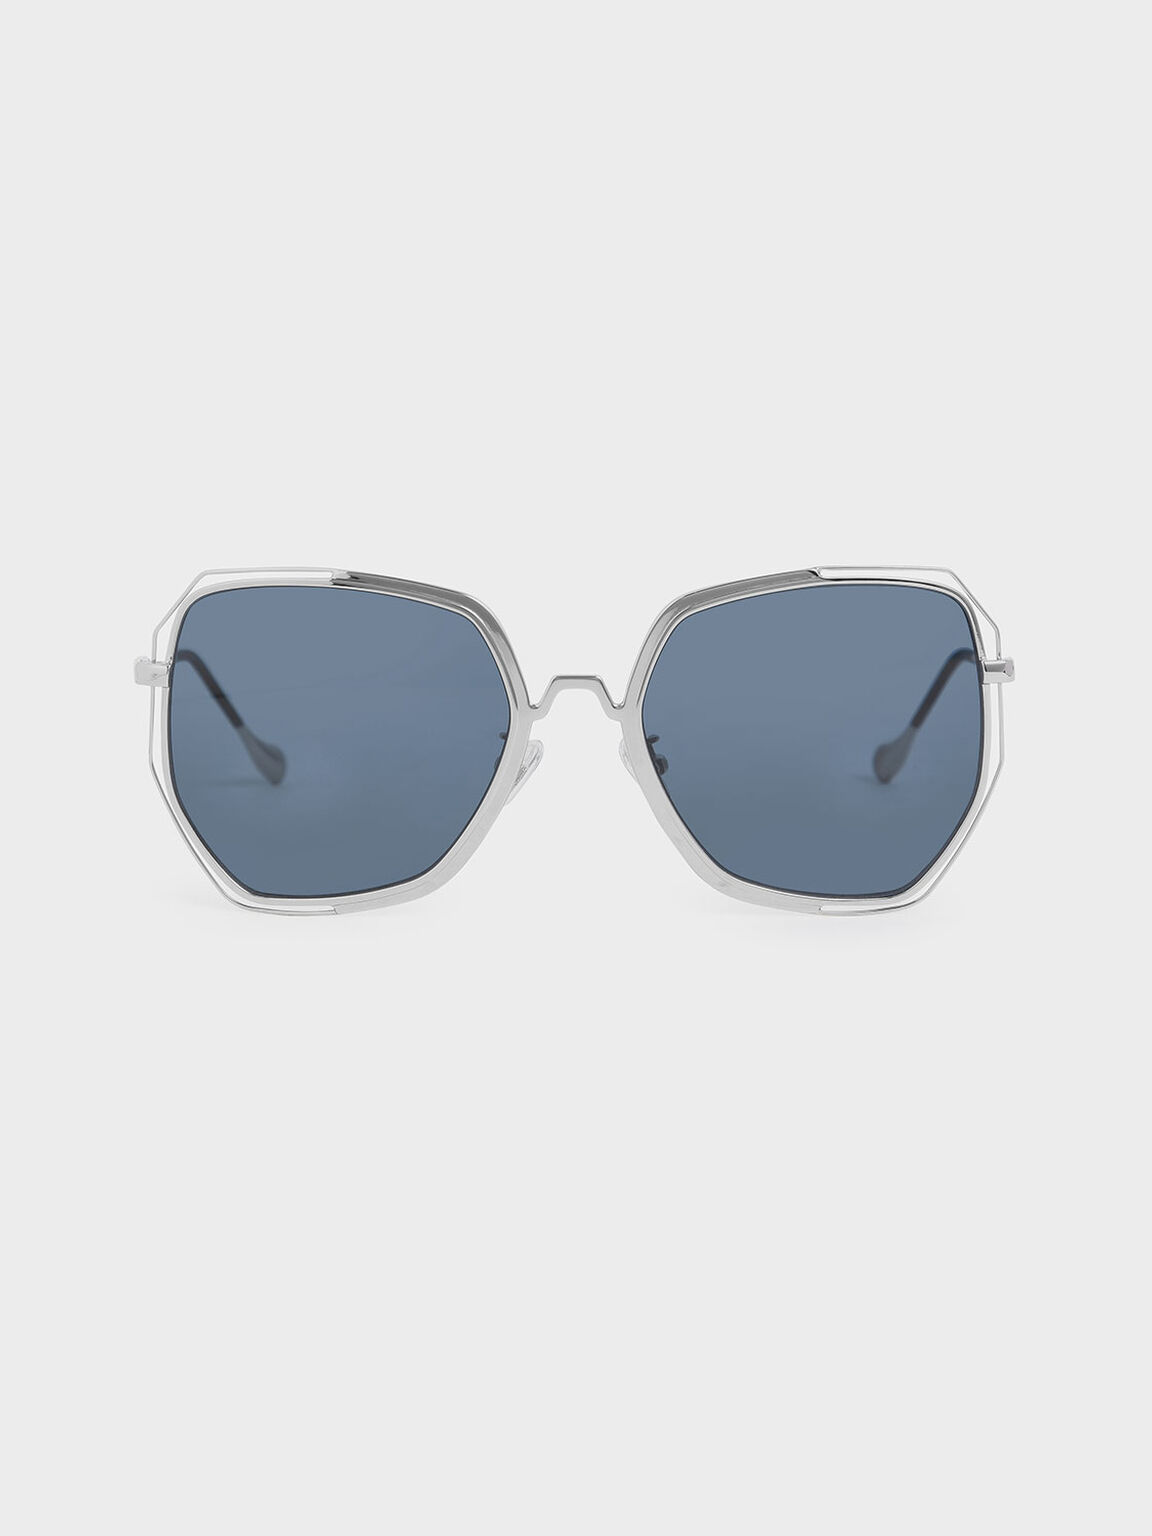 半鏤空蝴蝶框墨鏡, 深藍色, hi-res